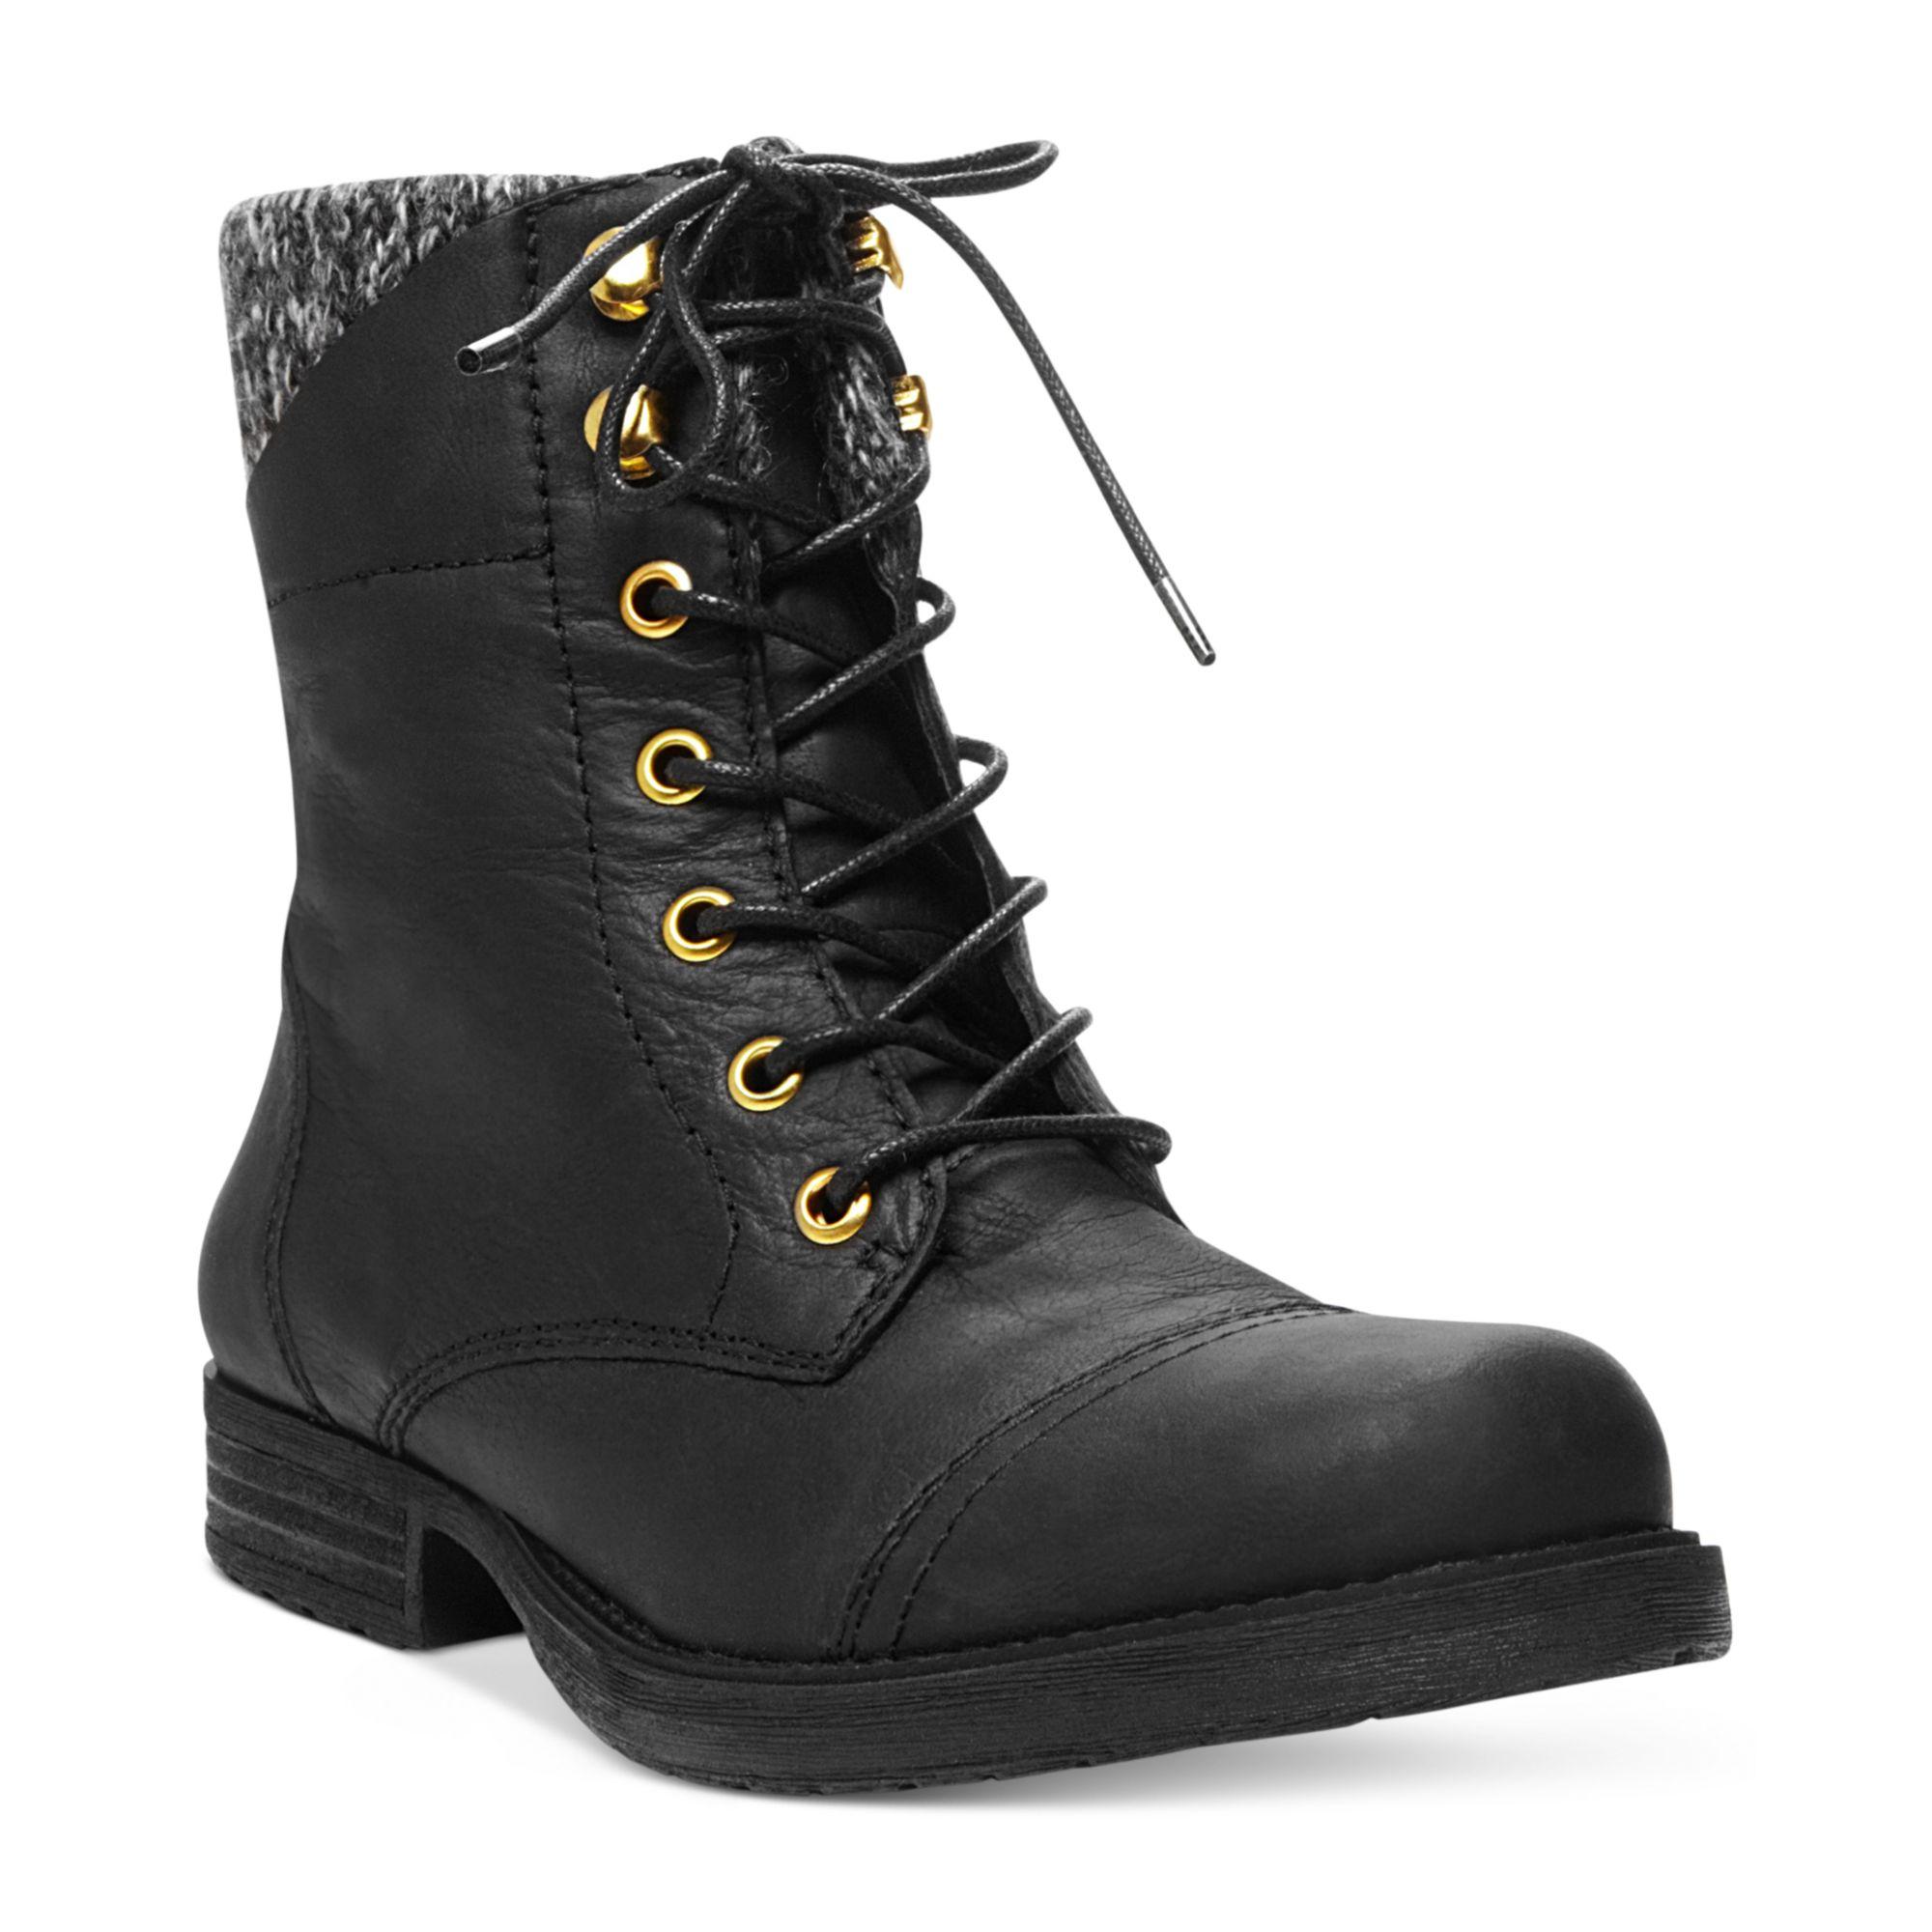 Steve Madden Womens Shoes Macy S